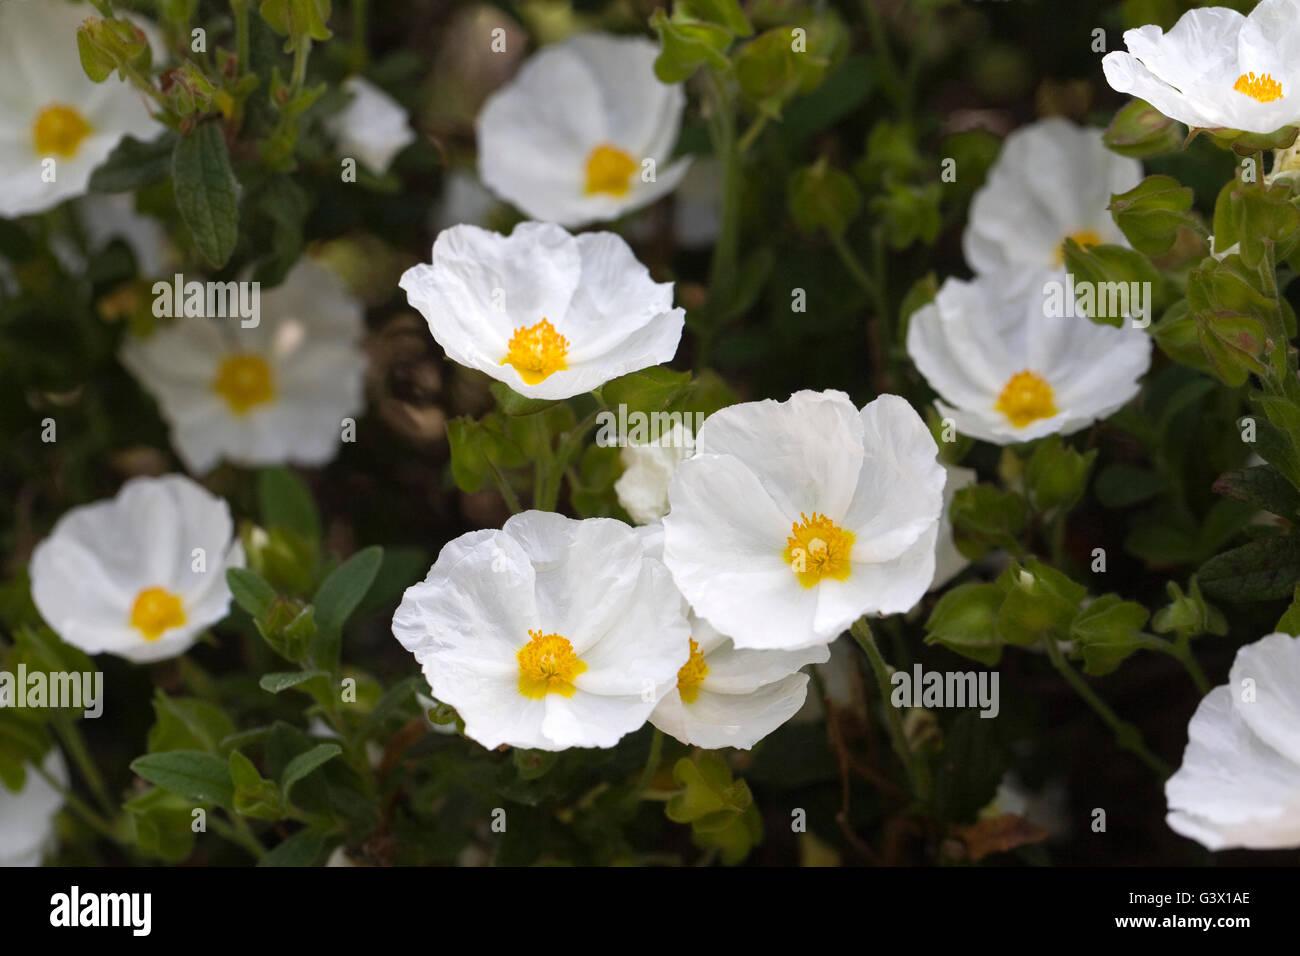 Cistus x obtusifolius 'Thrive'. Sun rockrose flowers. - Stock Image